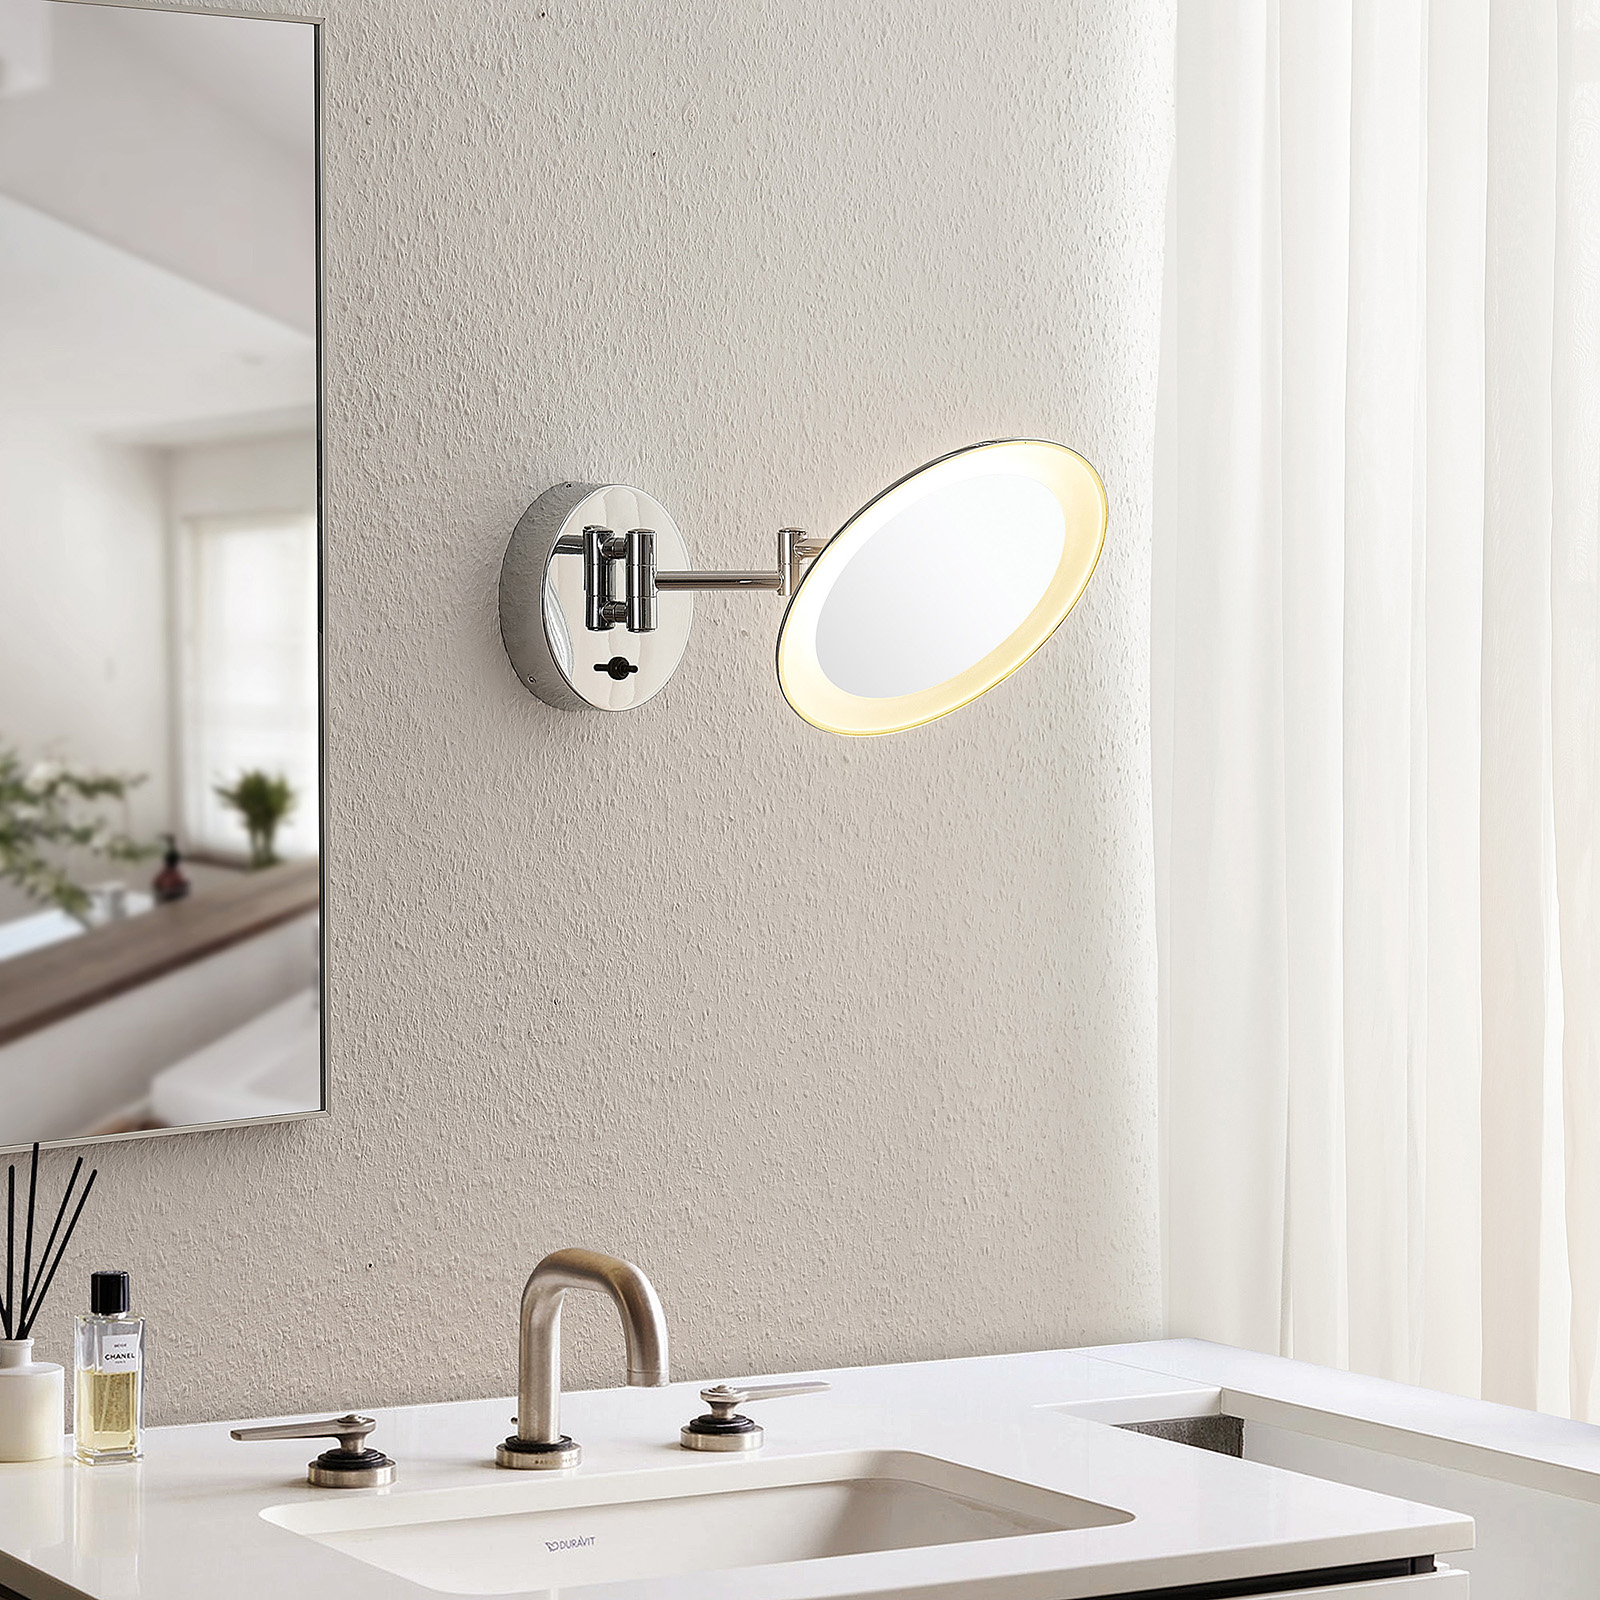 Lindby Fiana cosmeticaspiegel met LED-licht